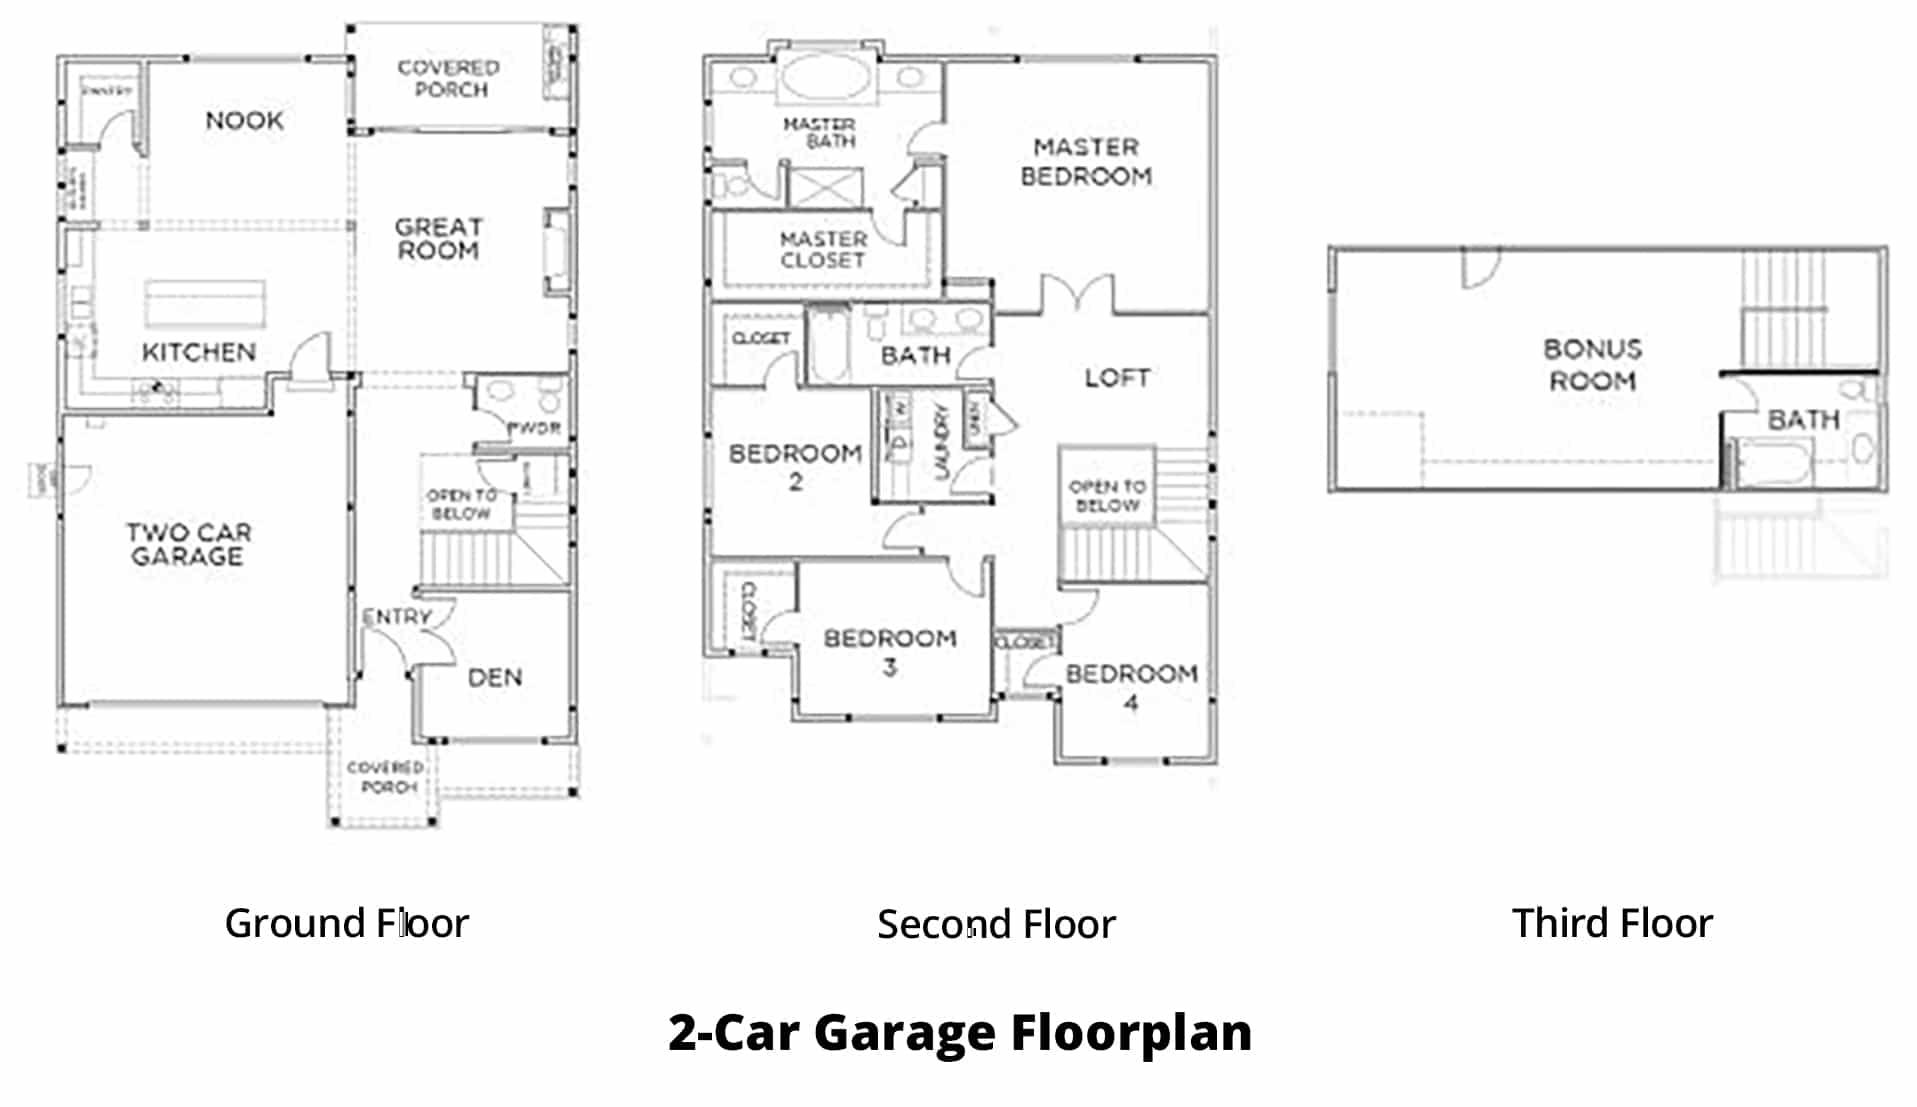 soundbuilt-tresco-floorplan-3162-labels